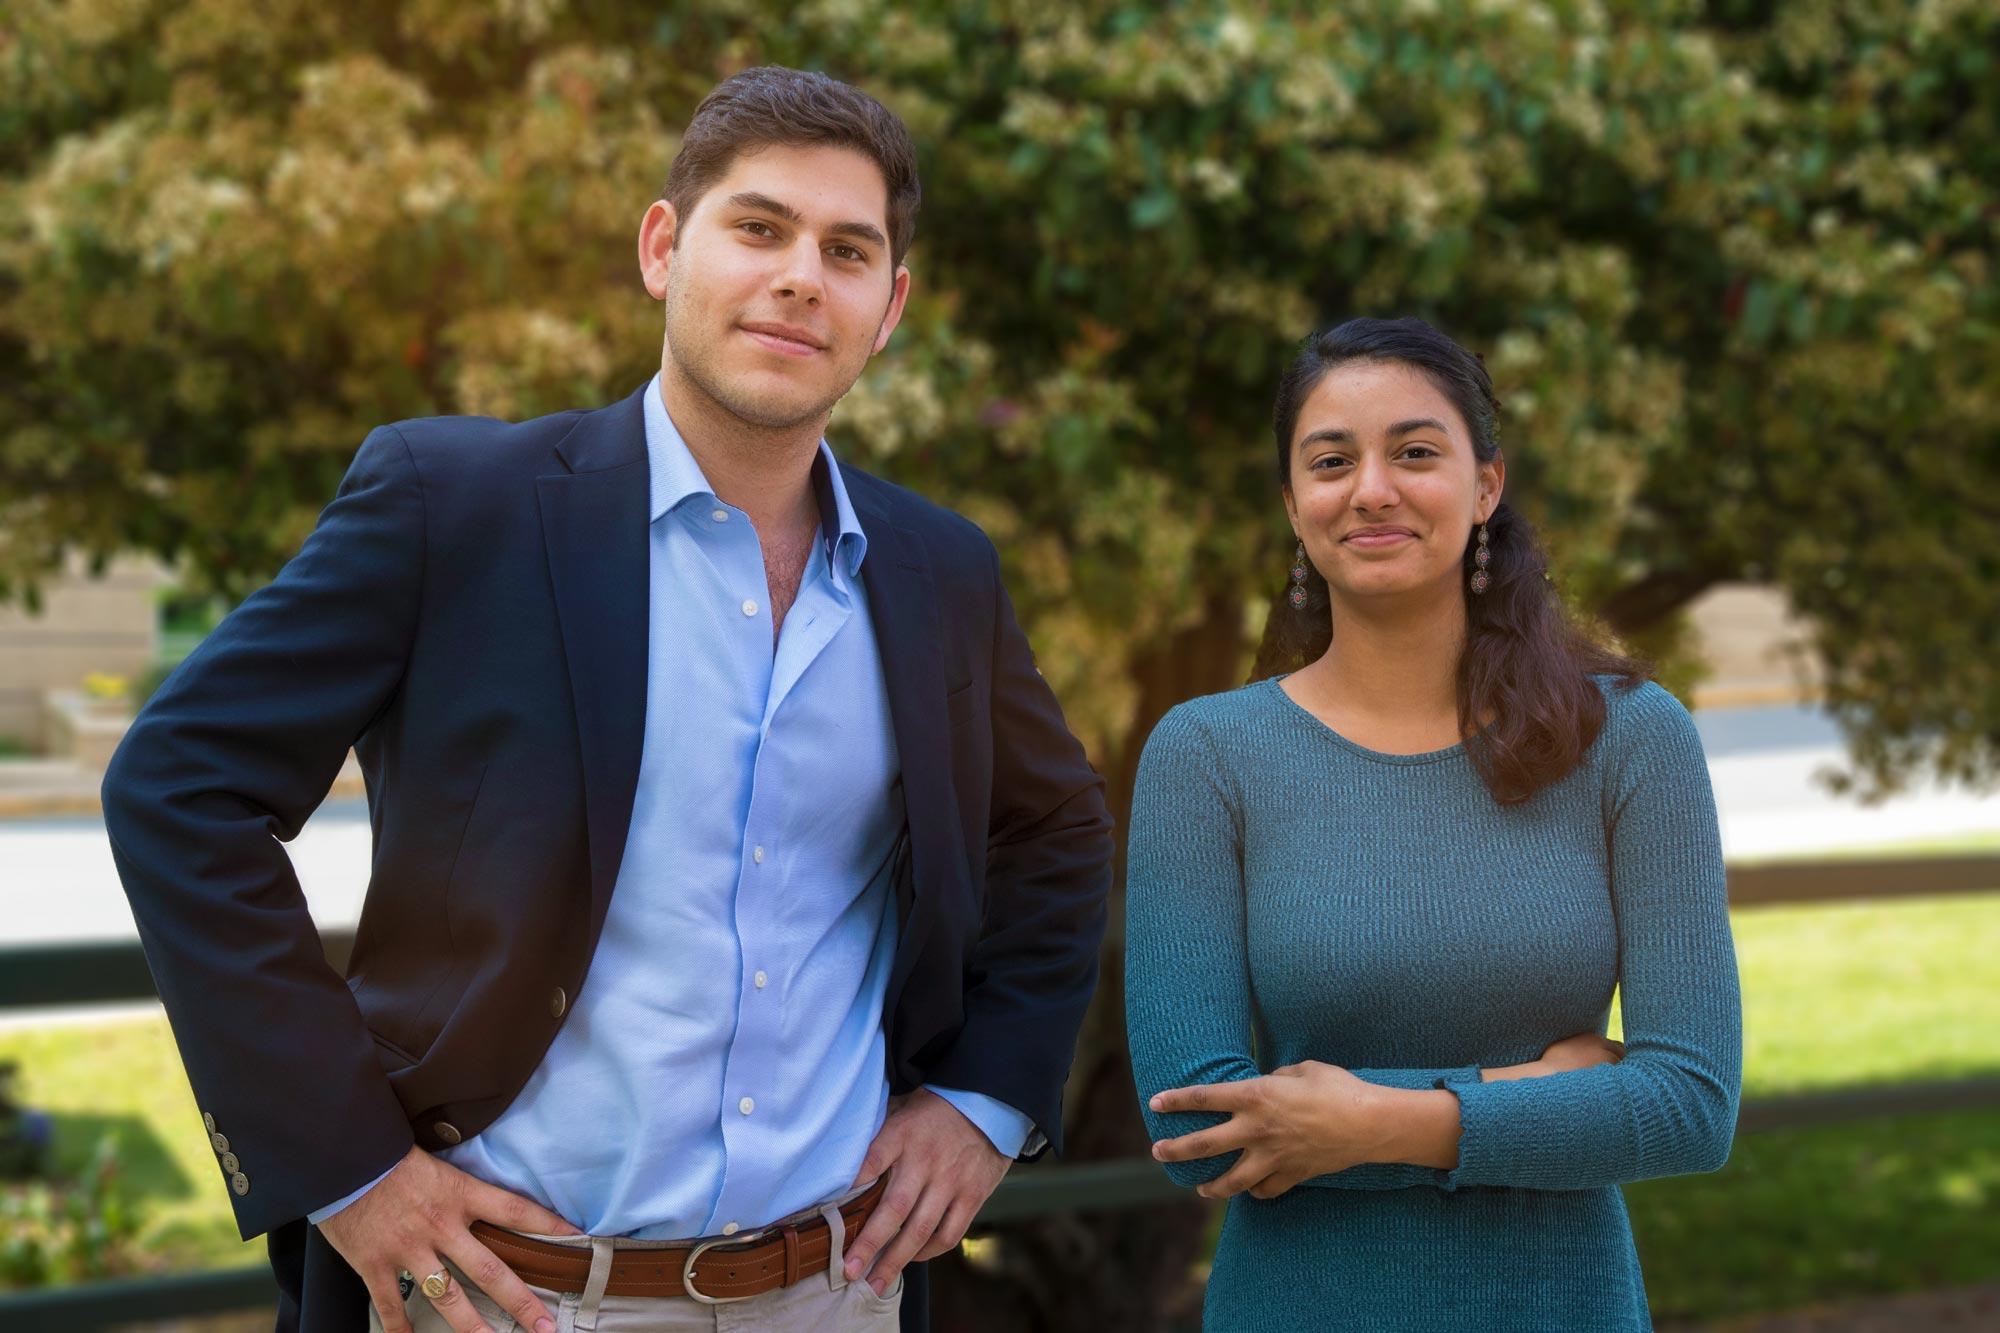 Marc Blatt is going to medical school at Vanderbilt University. Sabhi Singh will attend the Albert Einstein College of Medicine. (Photo by Dan Addison, University Communications)